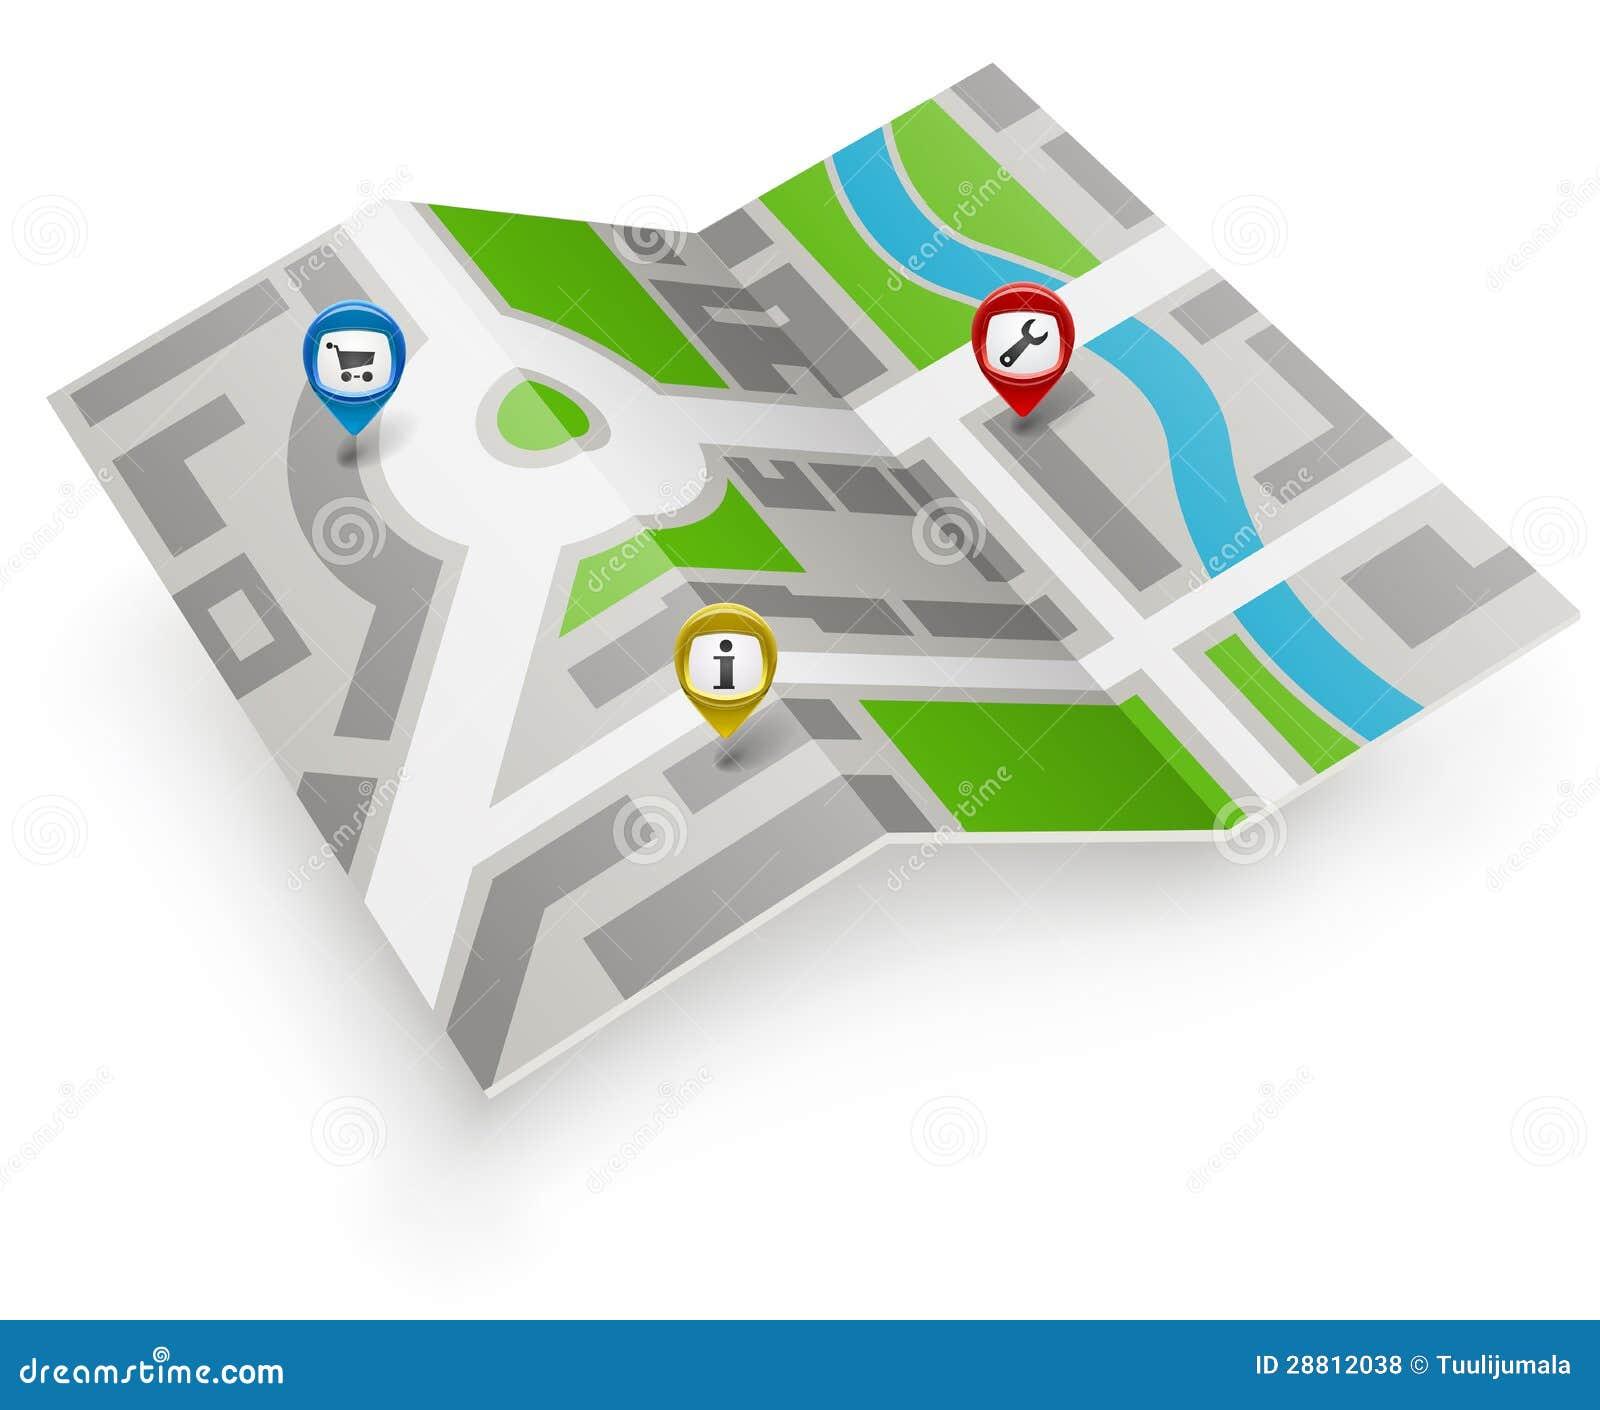 paper-map-icon-28812038 Google Map Navigator on google ls, google eagles, google navigation icon, google excel, google navigation for pc, google mercury, google doctor, google neptune, google yamaha, google airport, google maps, google latitude, google phoenix, google custom, google titan, google engine,